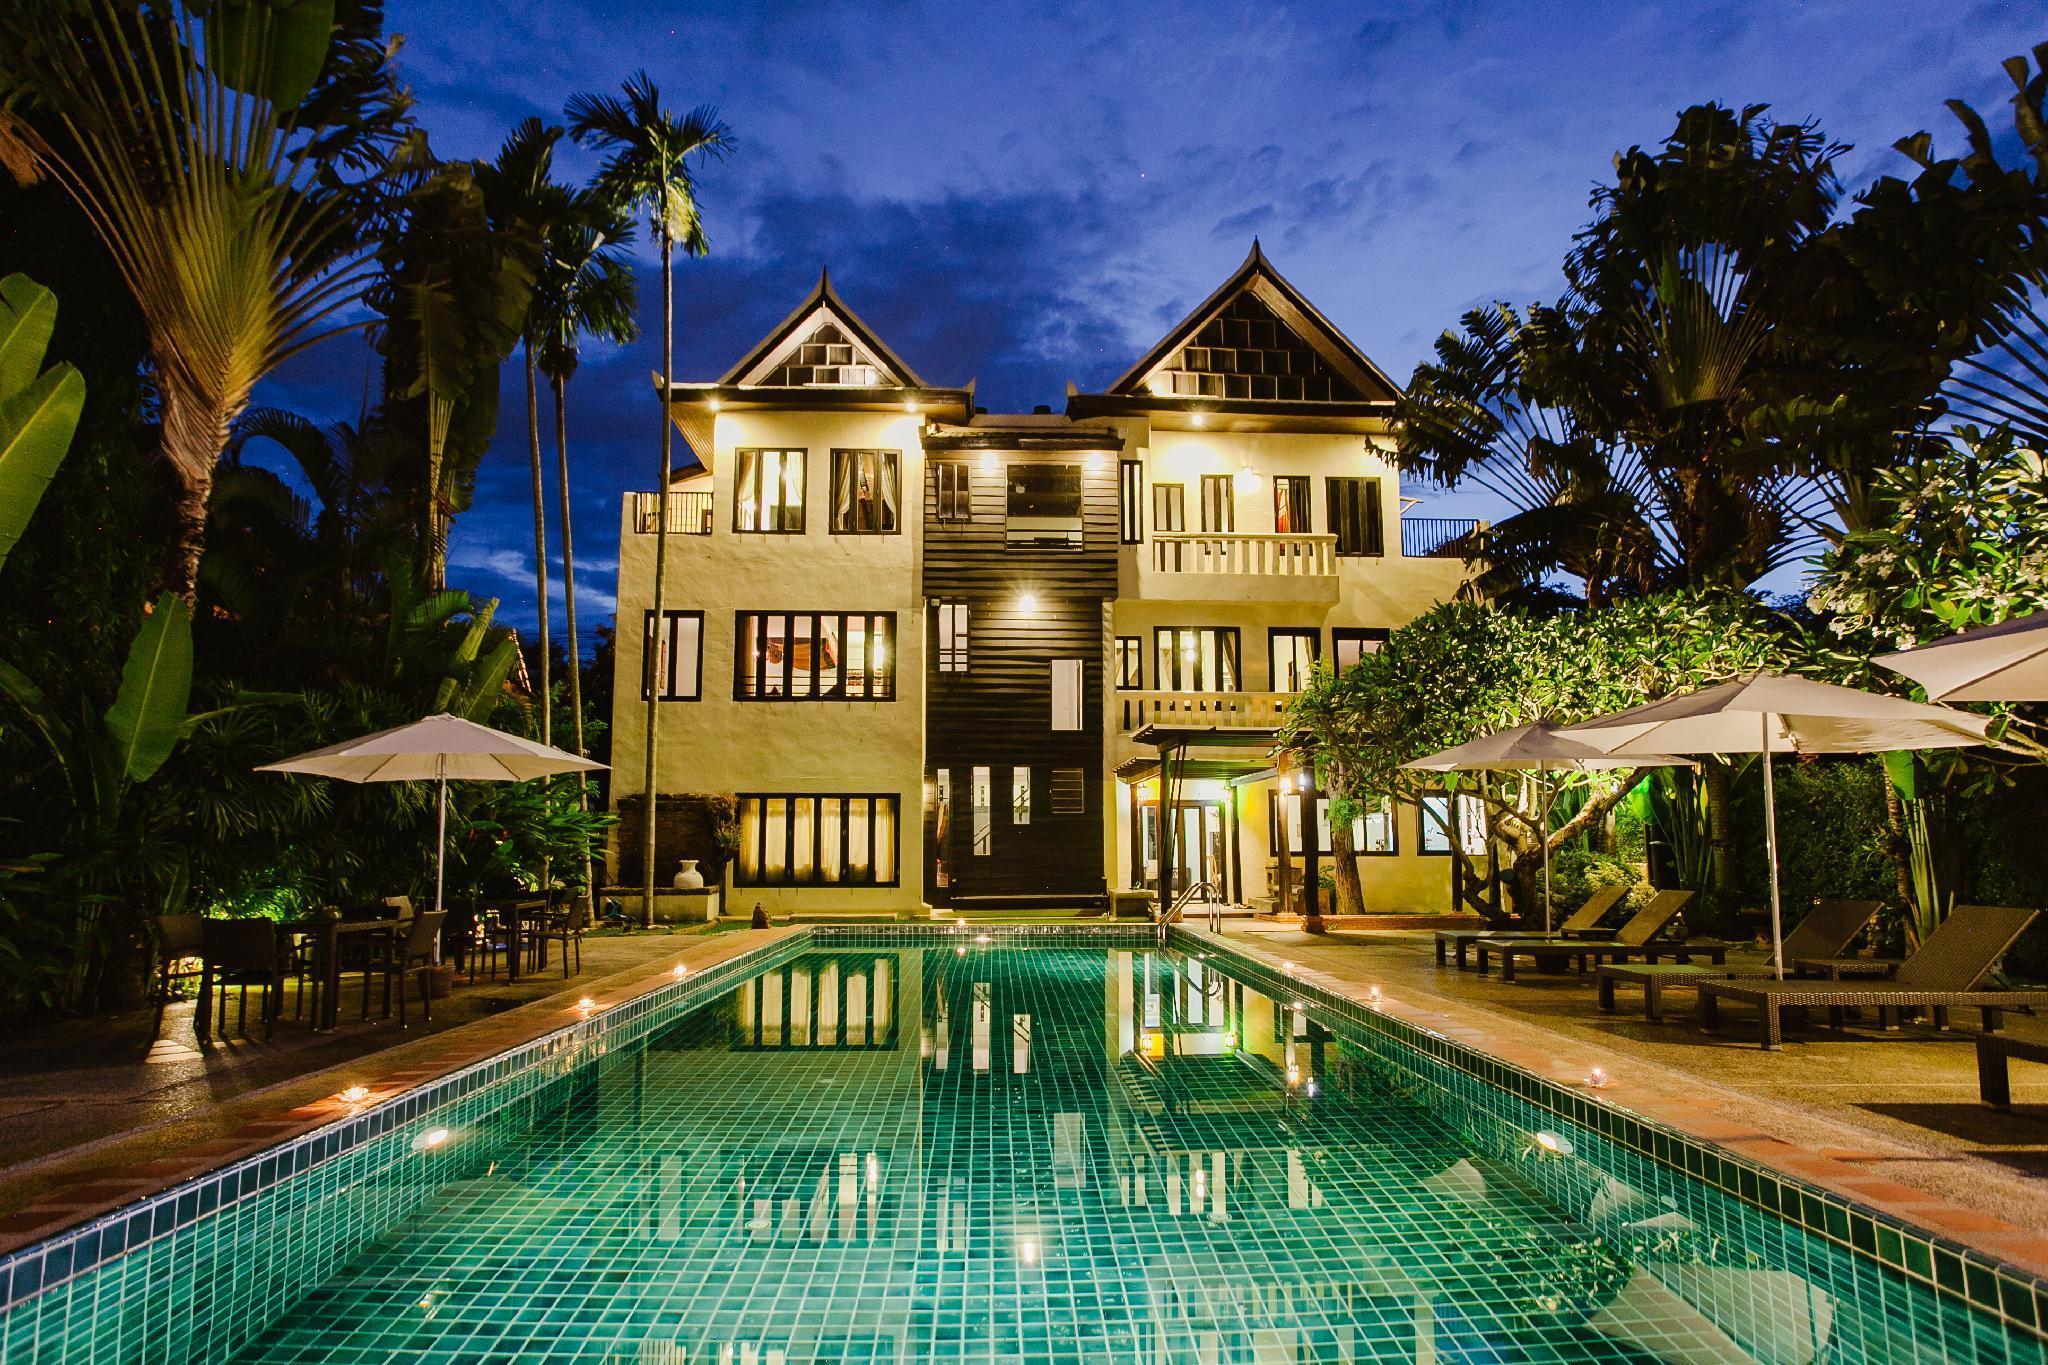 Initial Dawn Riverside villa วิลลา 5 ห้องนอน 5 ห้องน้ำส่วนตัว ขนาด 500 ตร.ม. – หางดง